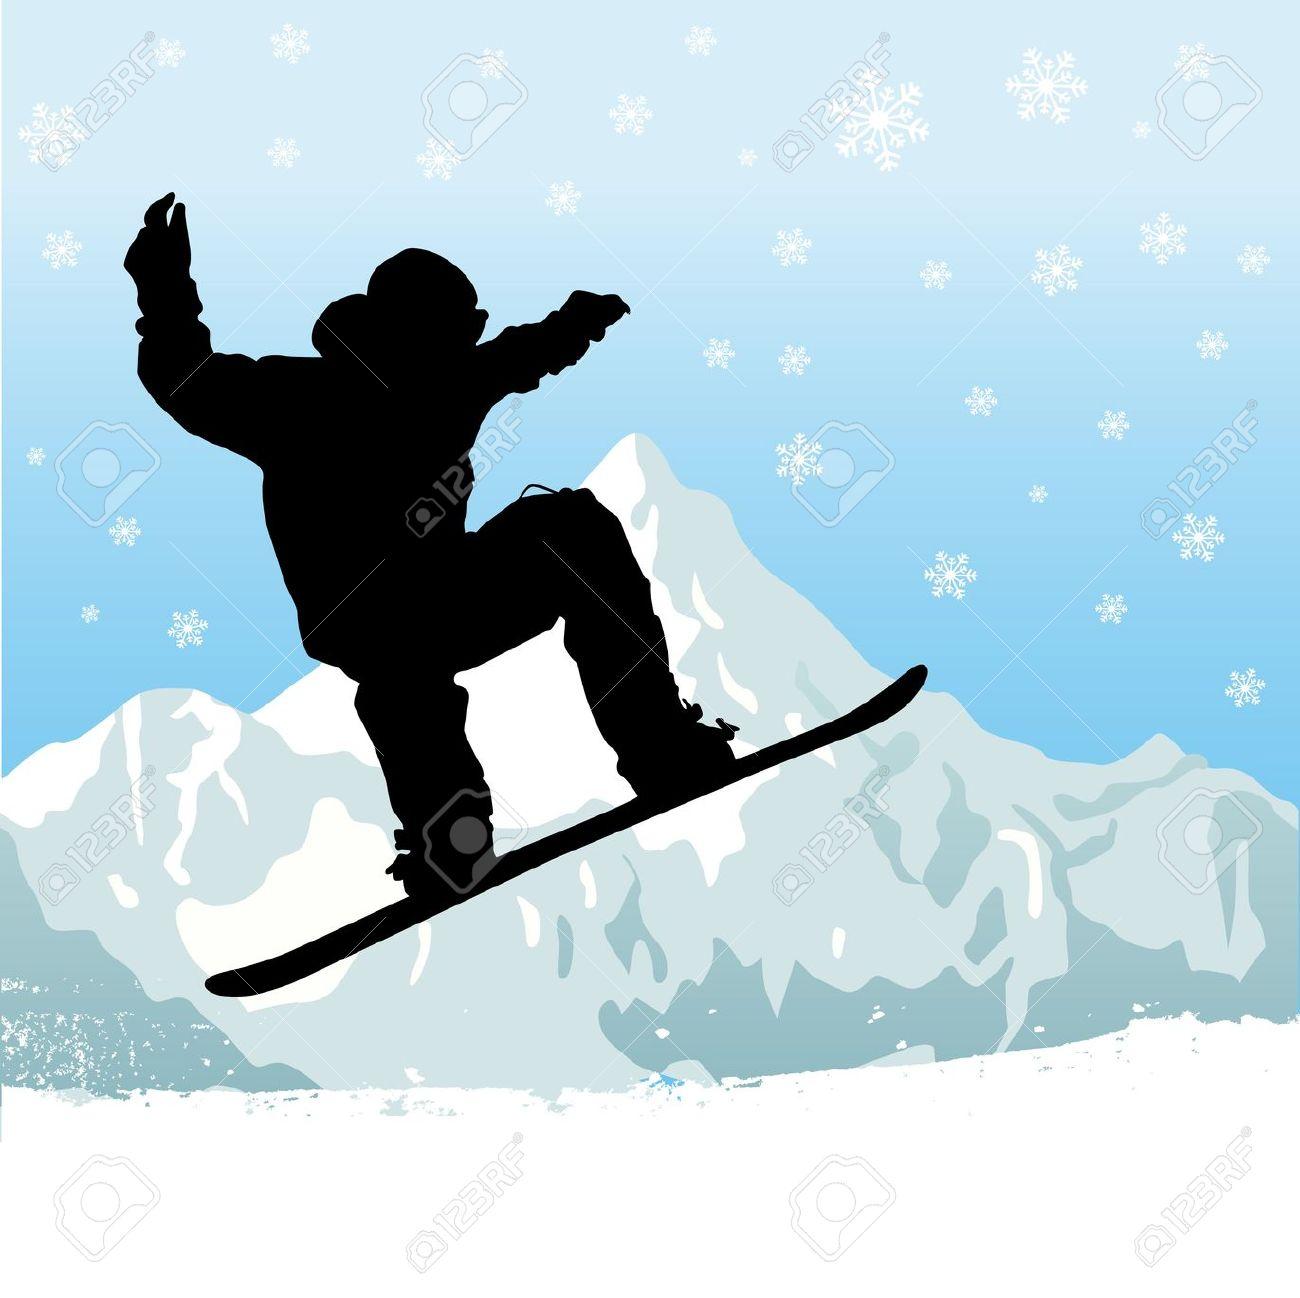 Snow board clipart clip stock 18+ Snowboarding Clipart | ClipartLook clip stock